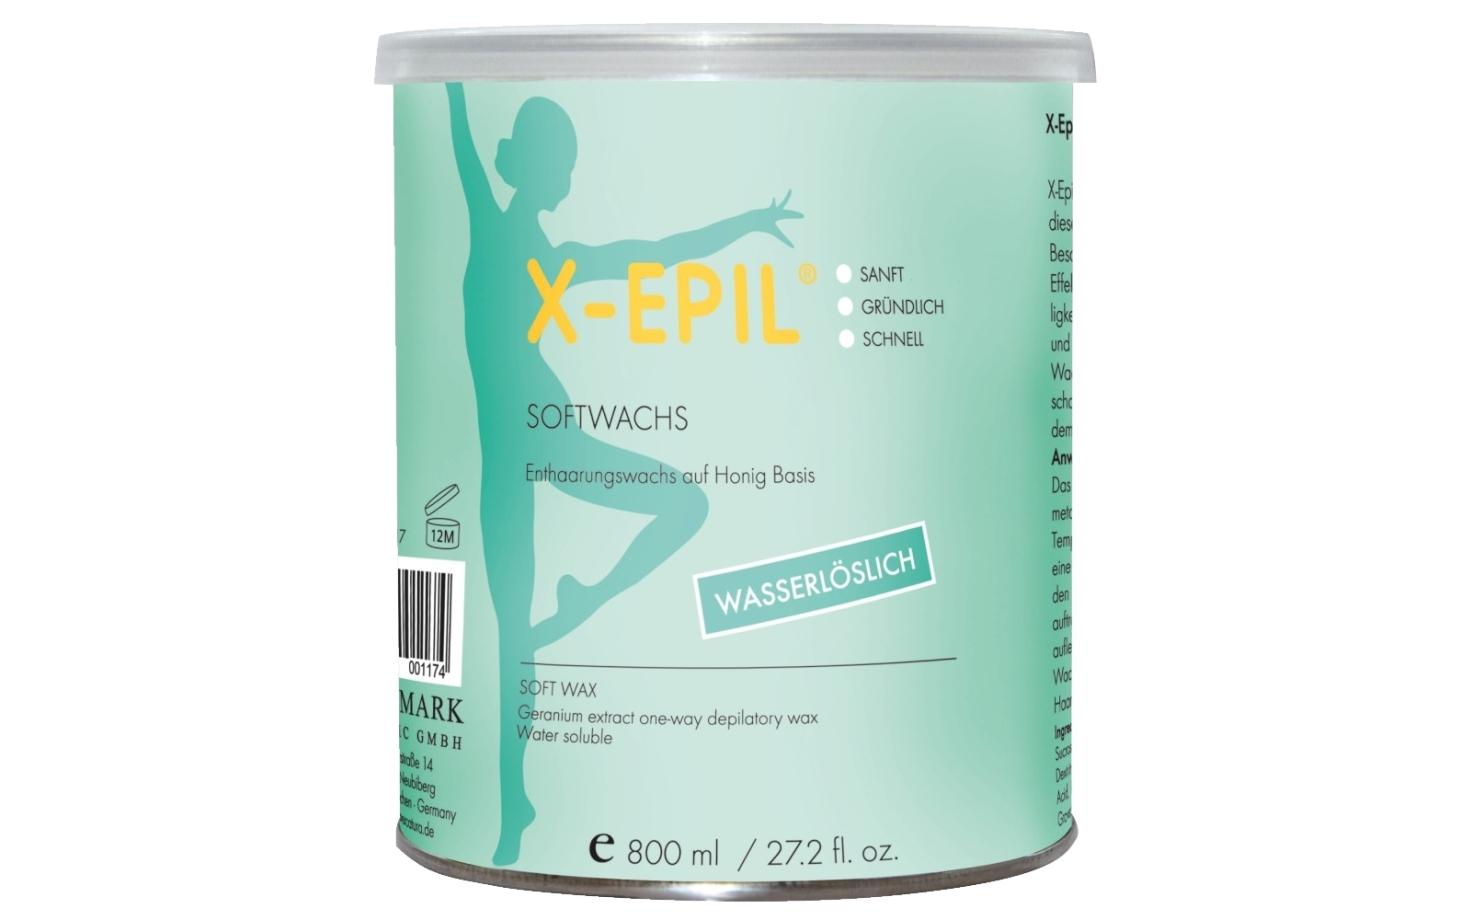 X-Epil Enthaarungswachs 800 ml